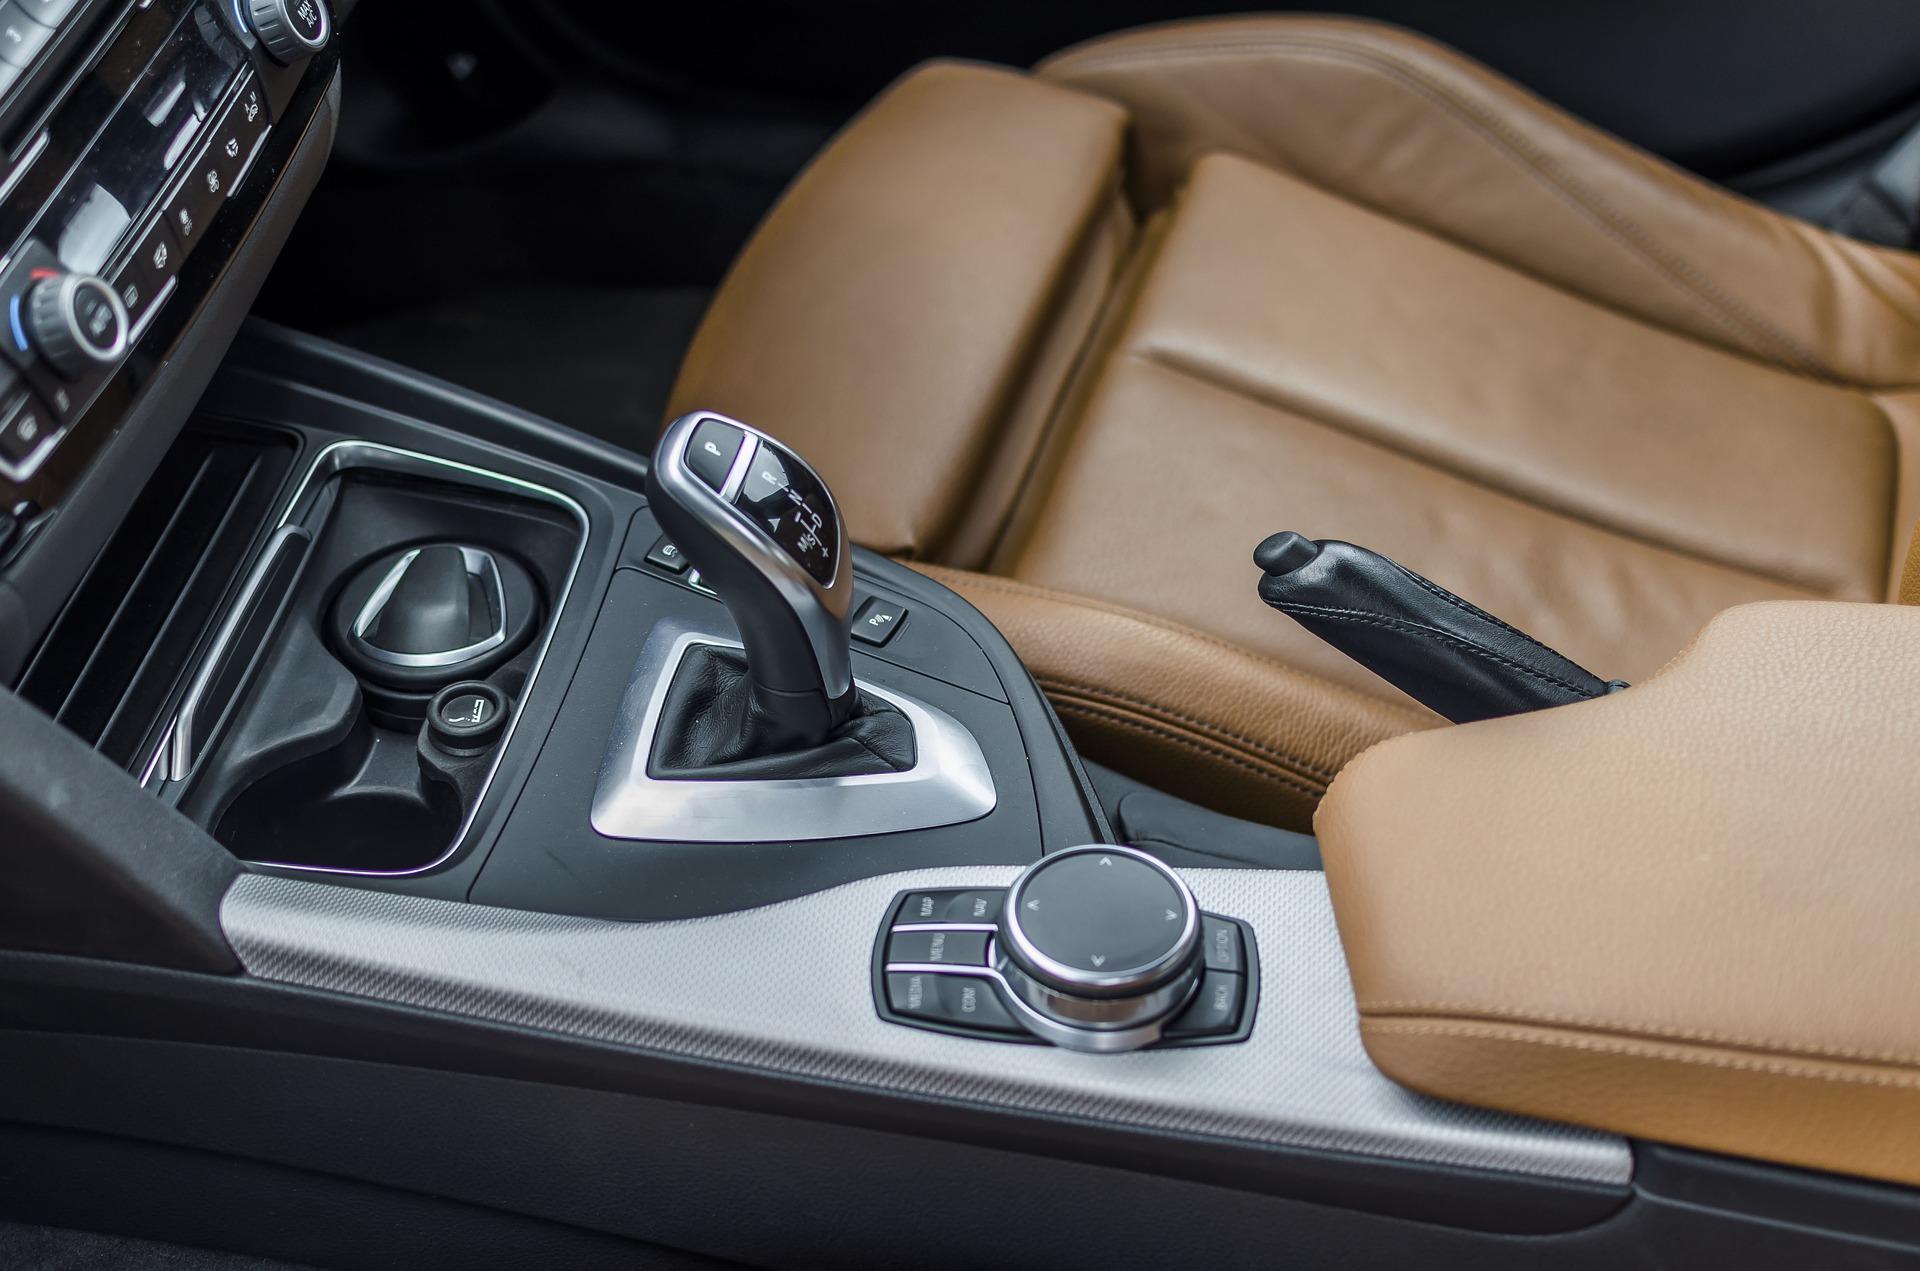 gear-shifter-3665960_1920.jpg